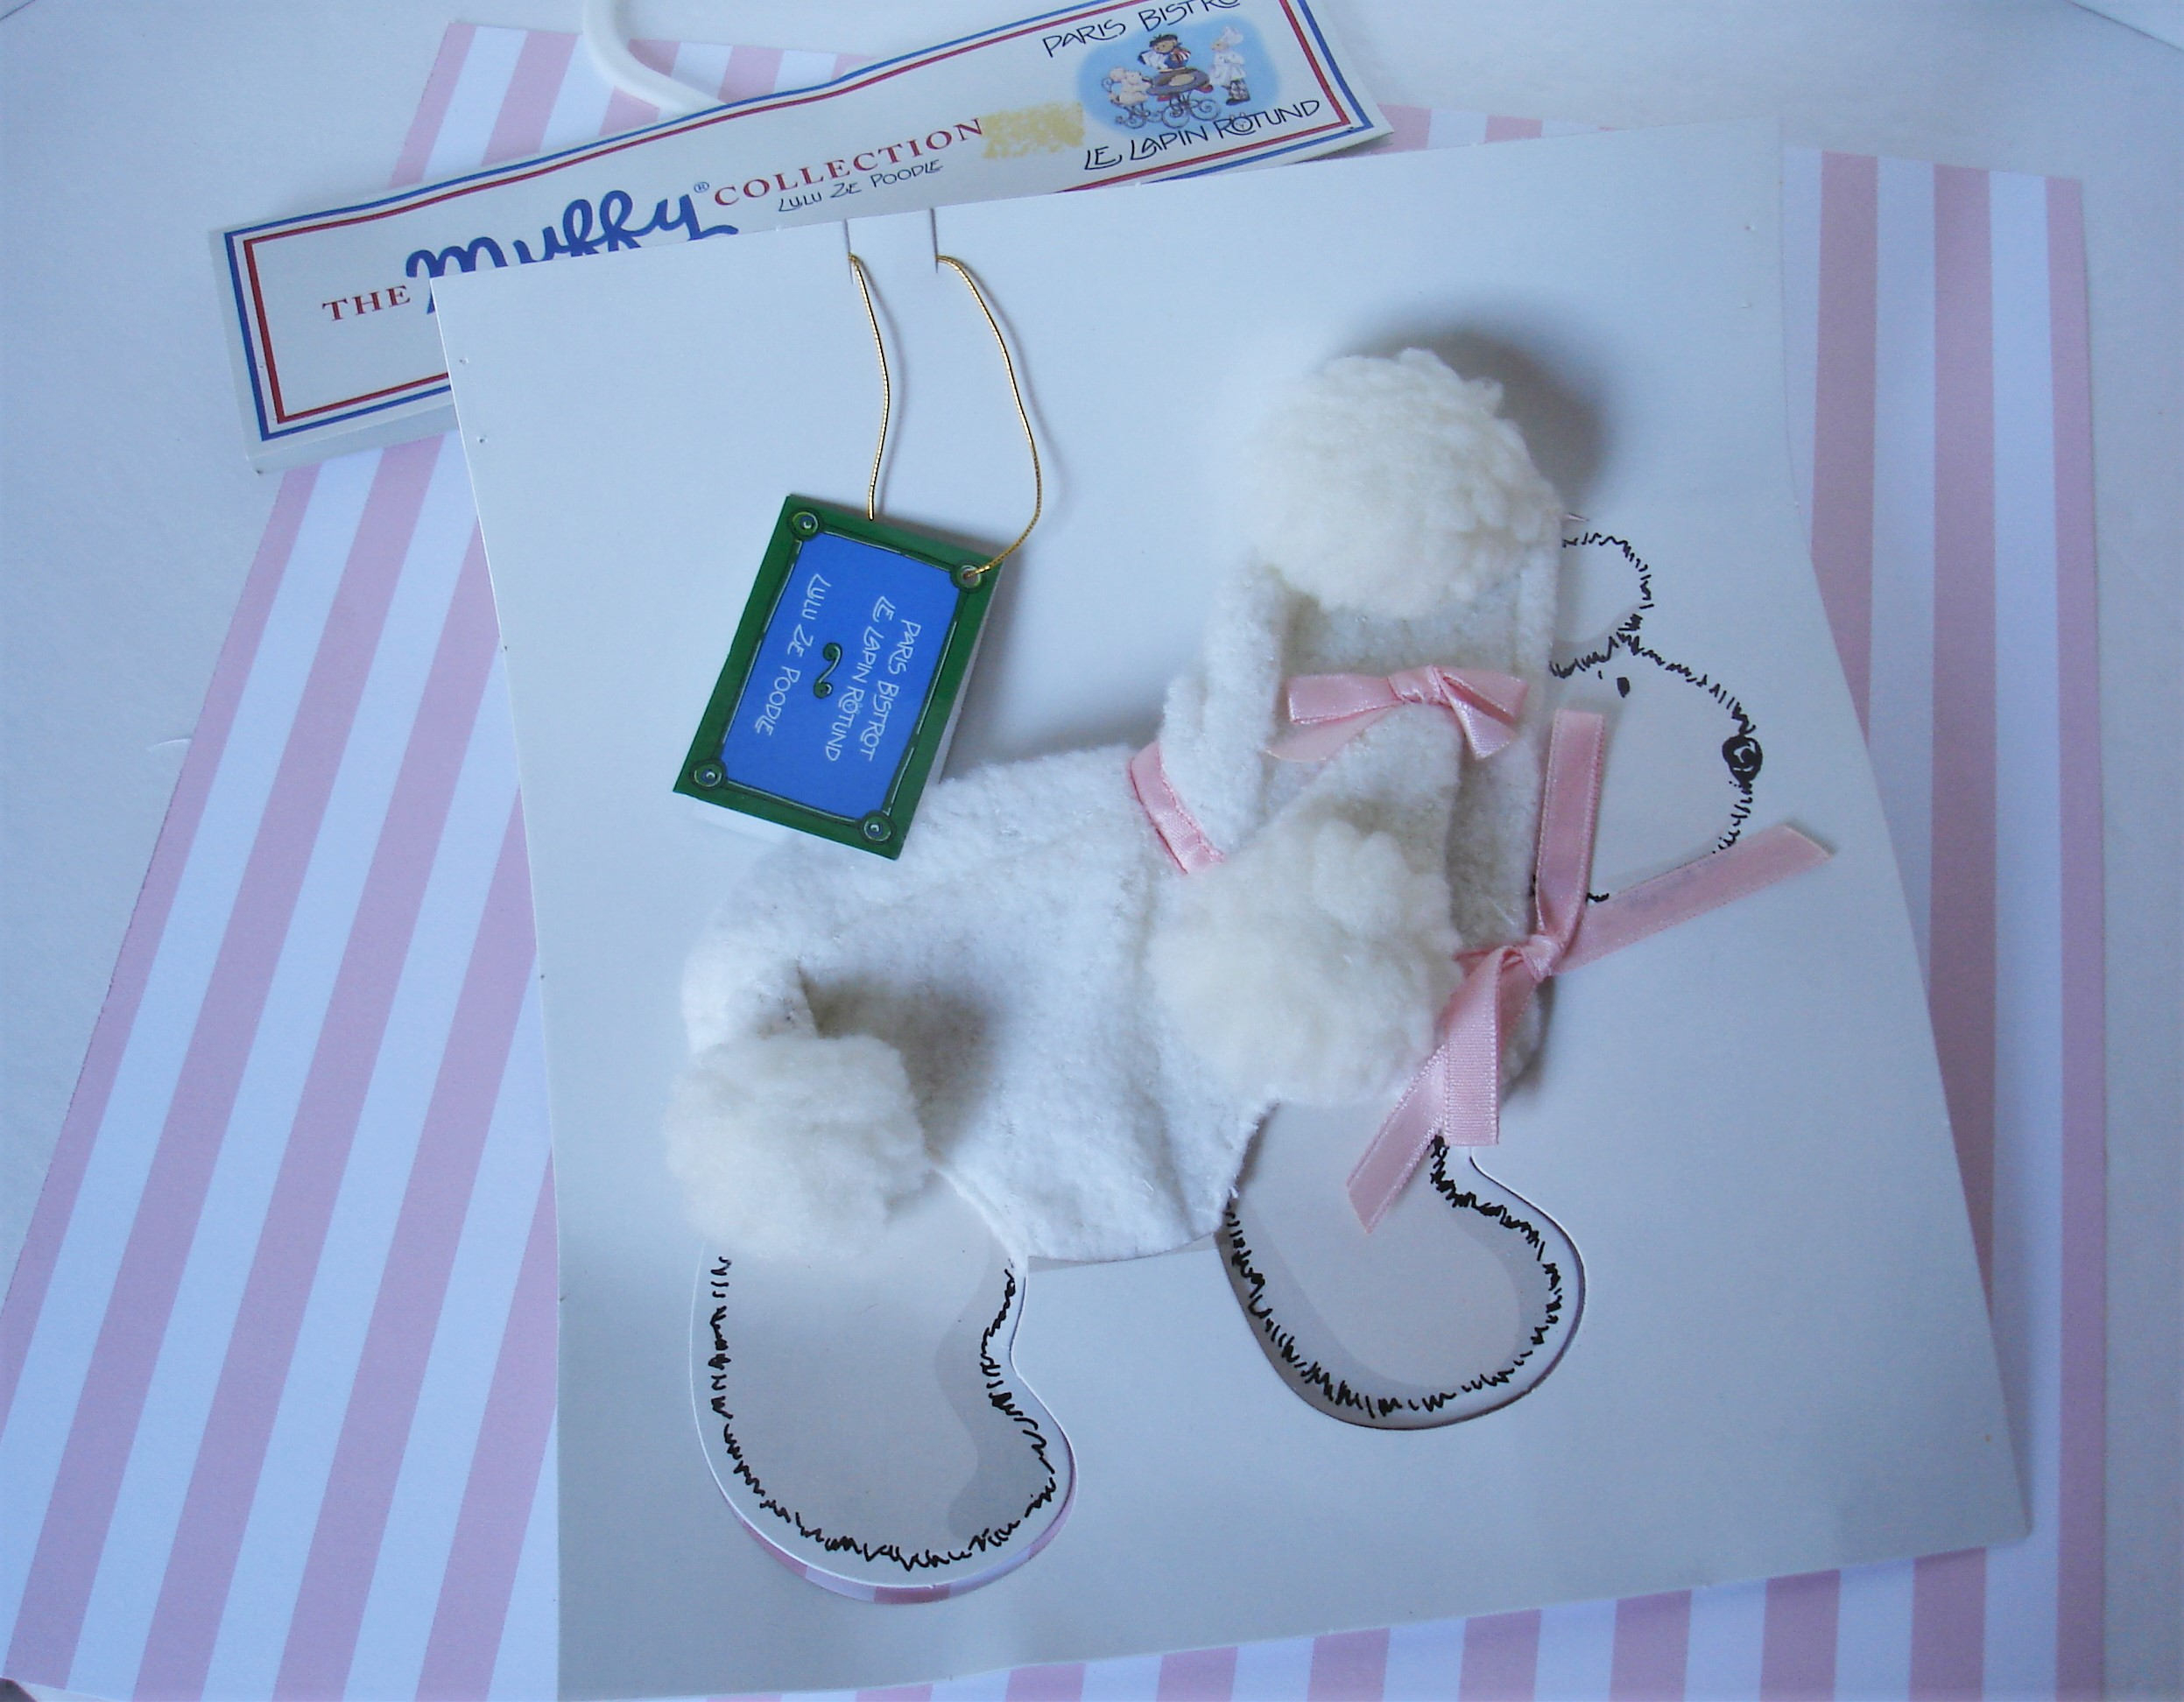 Muffy Vanderbear Lulu, Lulu Ze Poodle, Paris Bistrot: Le Lapin Rotund tout Lapin Lulu